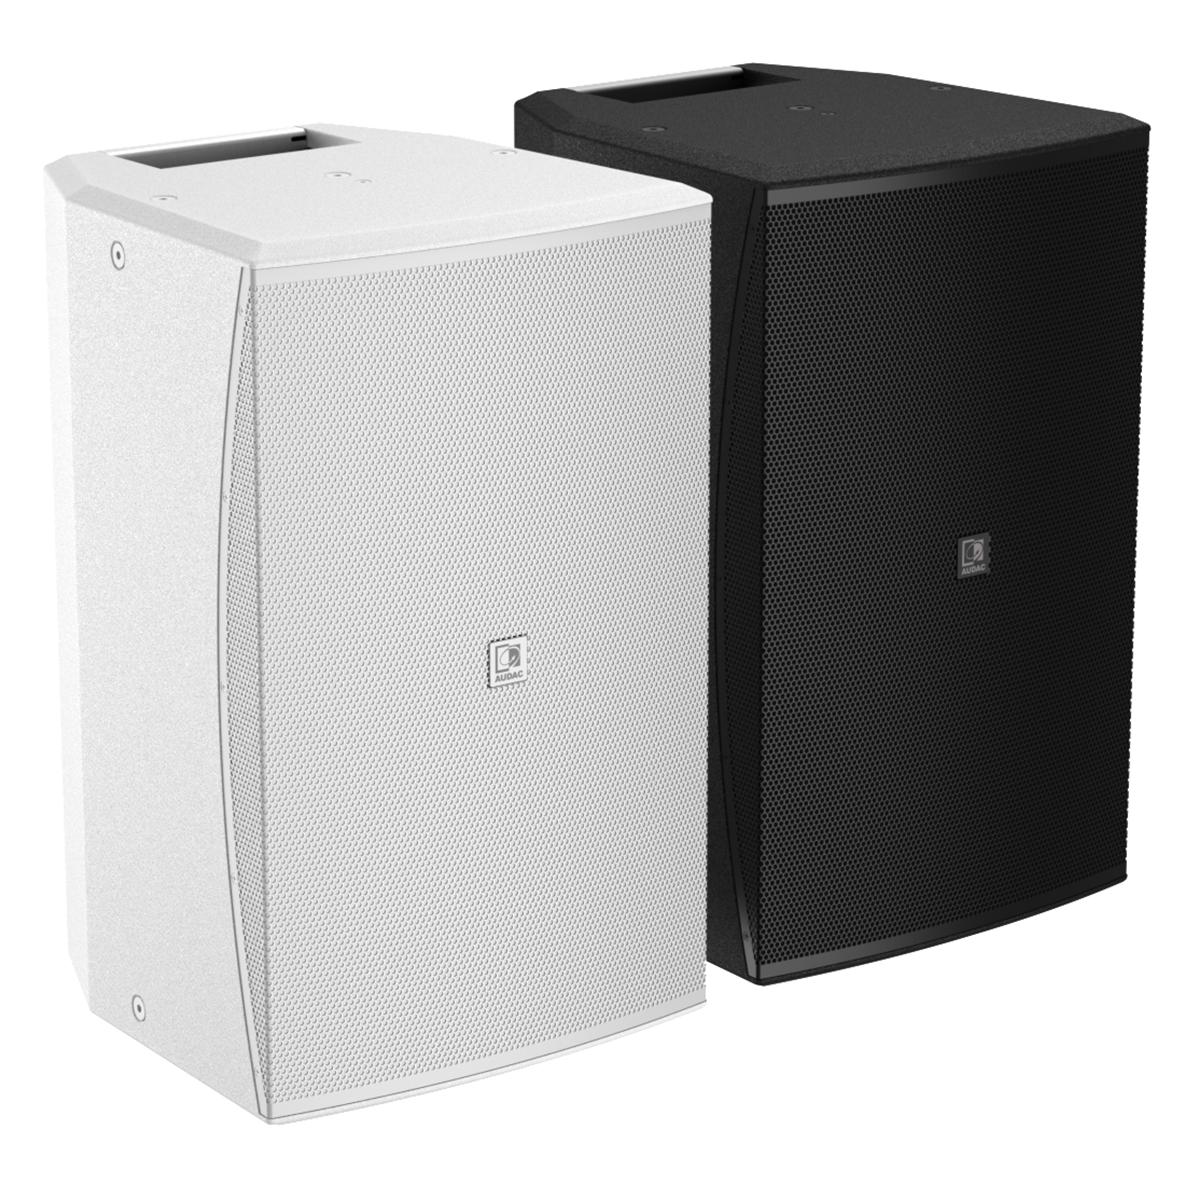 "VEXO115 - 15"" high-output 2-way loudspeaker"